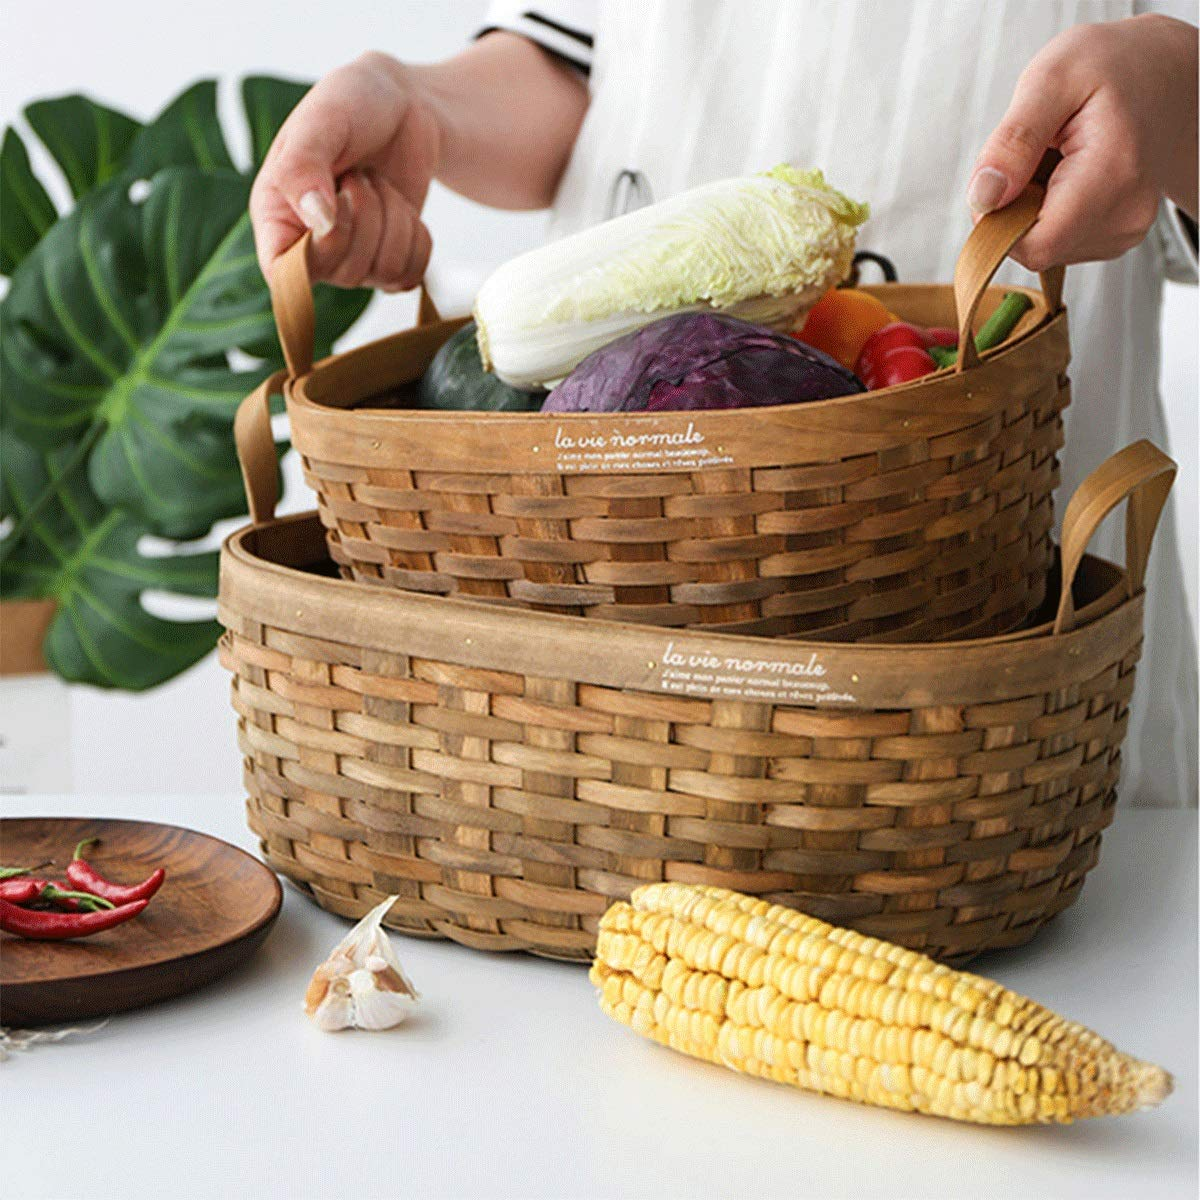 Tongboshi Bread Basket, Hand-Woven Storage Basket (with Handle), Picnic Fruit Bread Basket, Storage Basket, Oval Fruit Basket Three-Piece, Latest Models (Color : 3-Piece Set) by Tongboshi (Image #5)